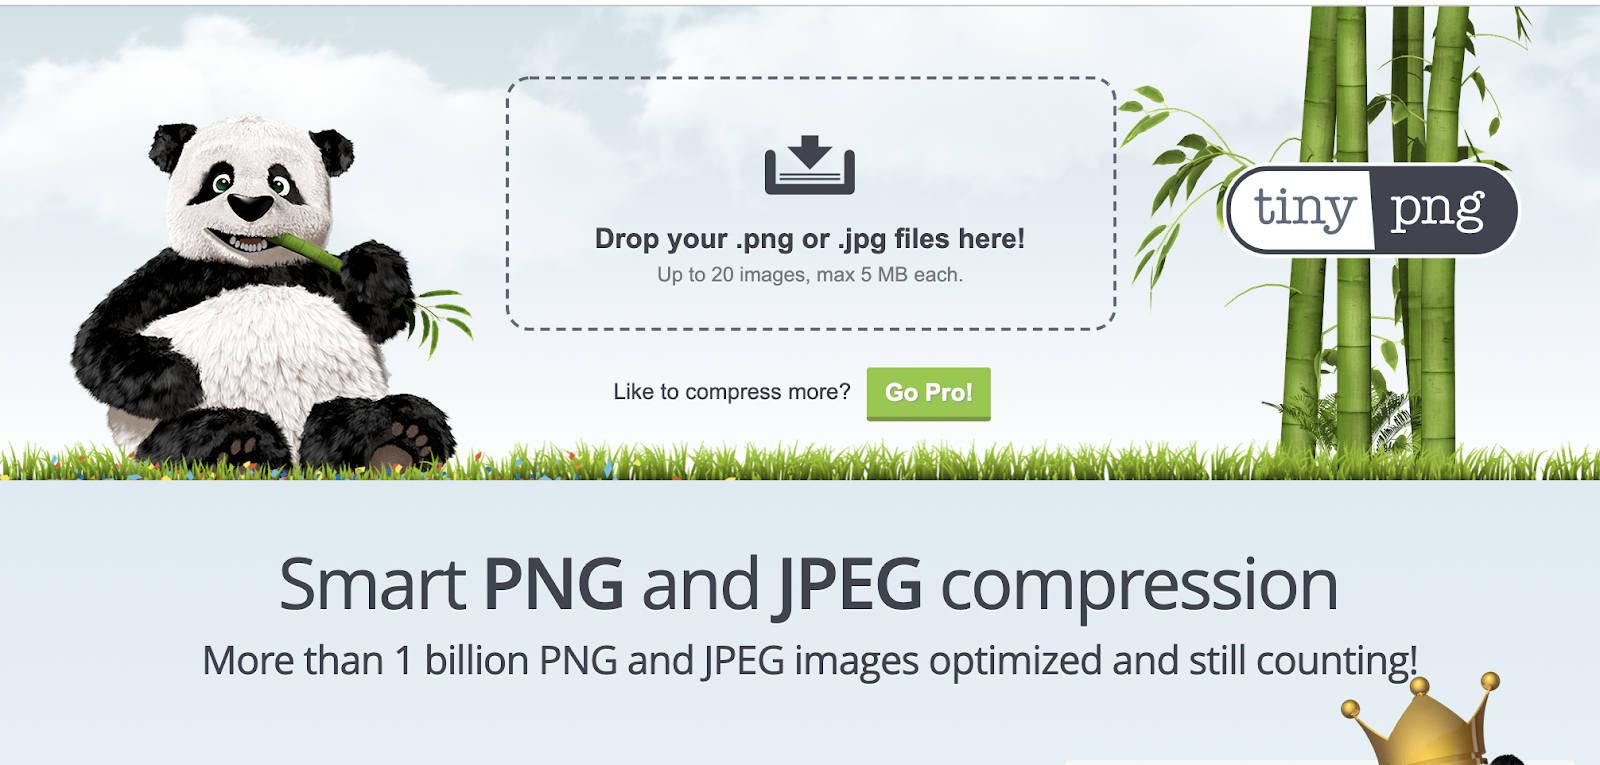 landing page optimization - tinypng